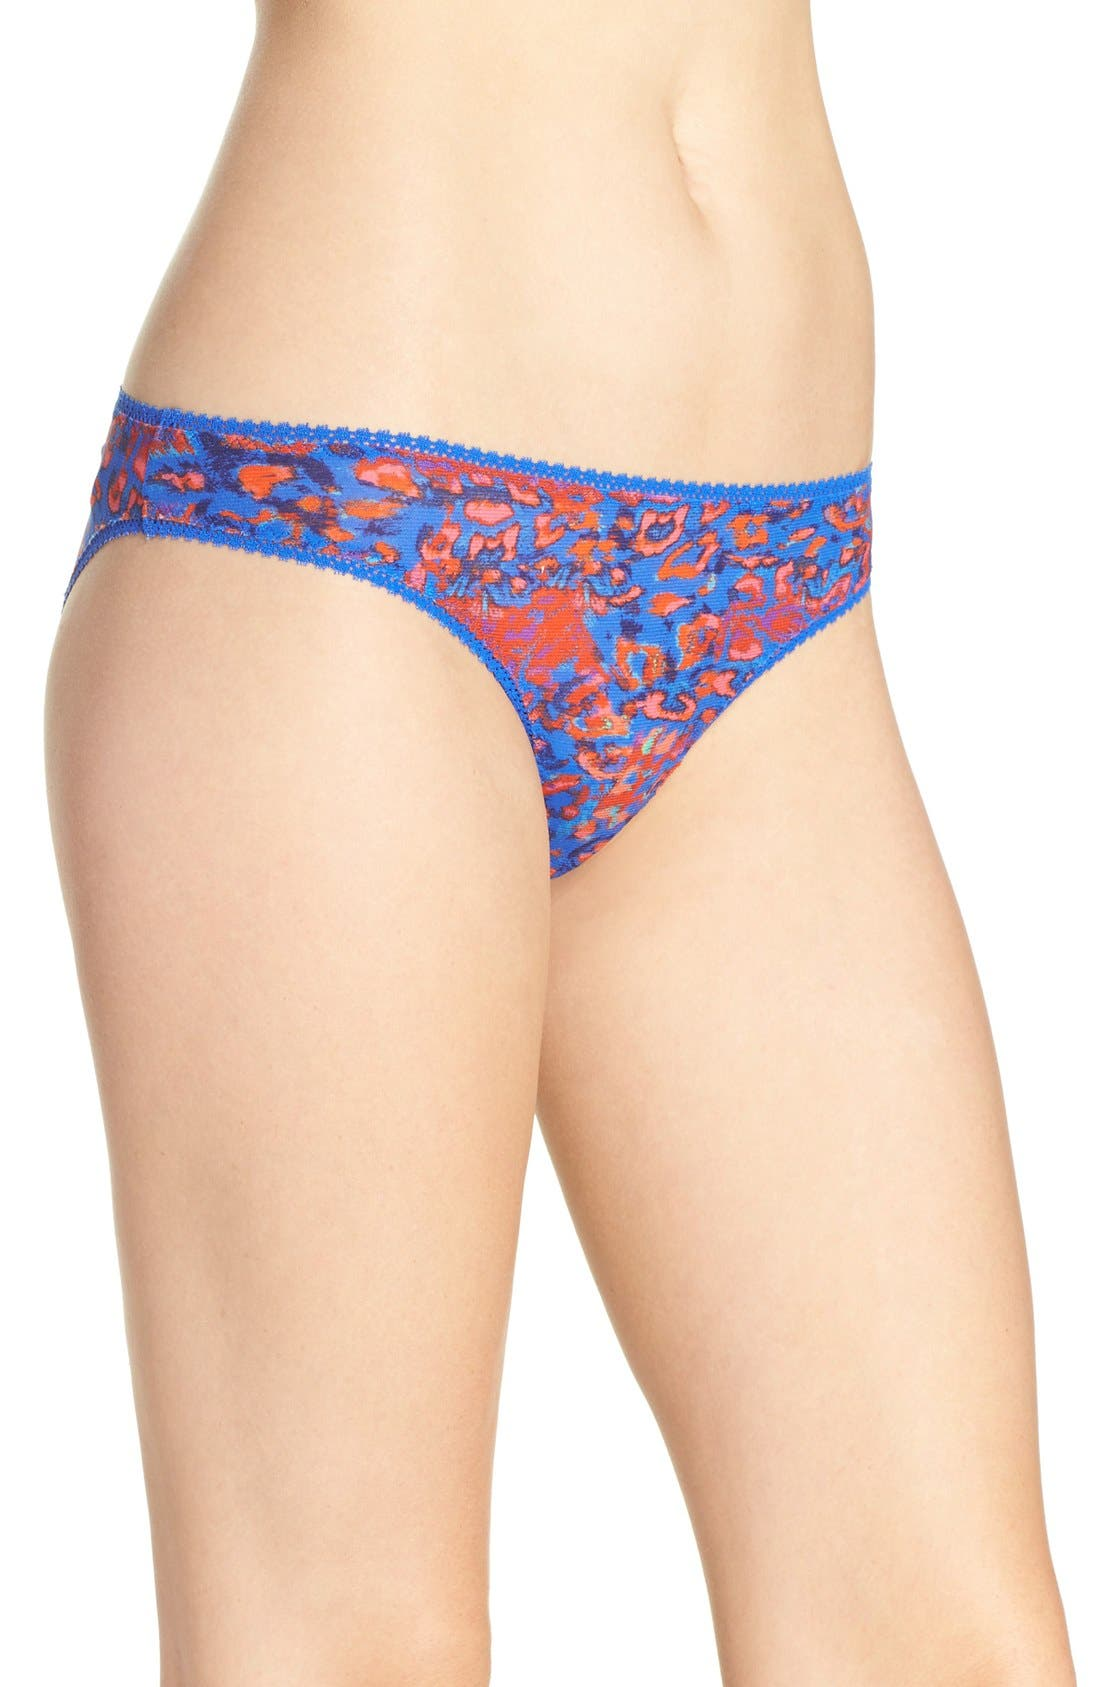 Alternate Image 3  - On Gossamer 'Triple Twist' Bikini (3 for $45)